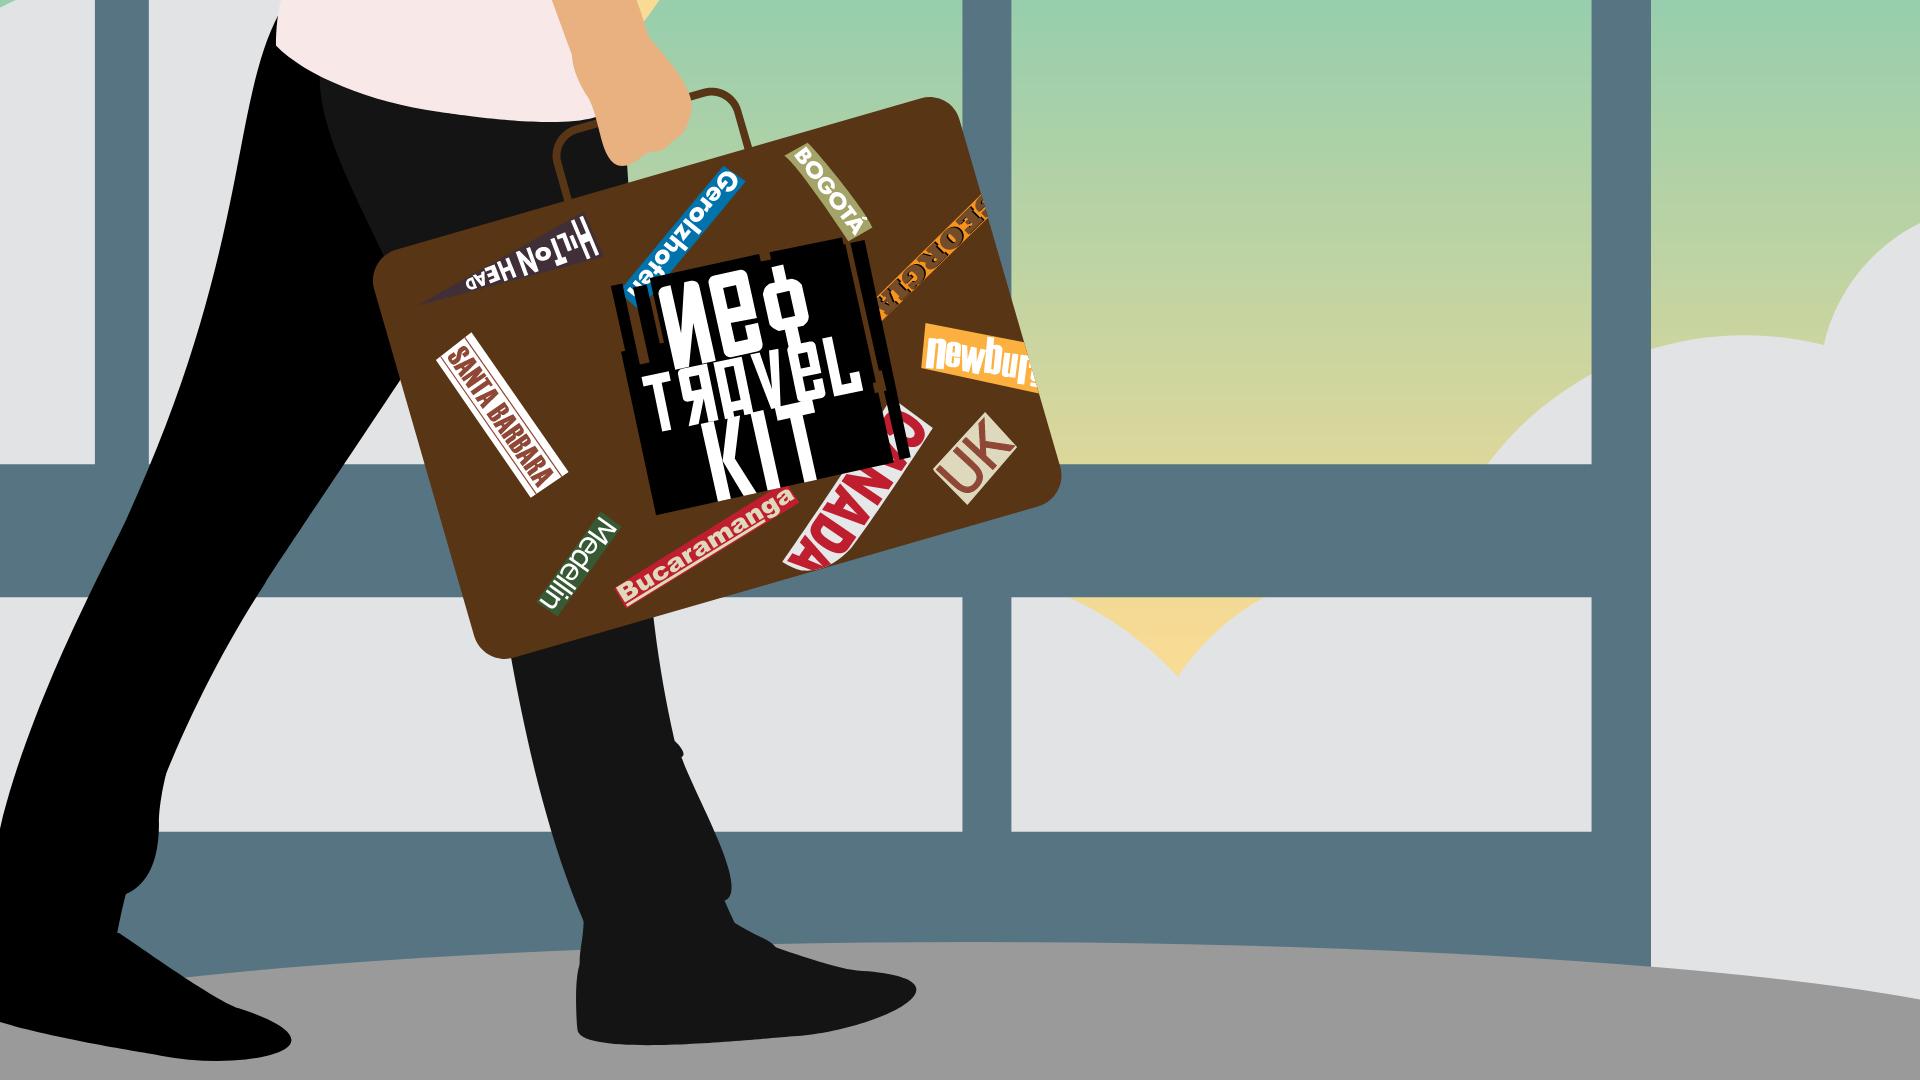 TPR901 Neo Travel Kit 19 años